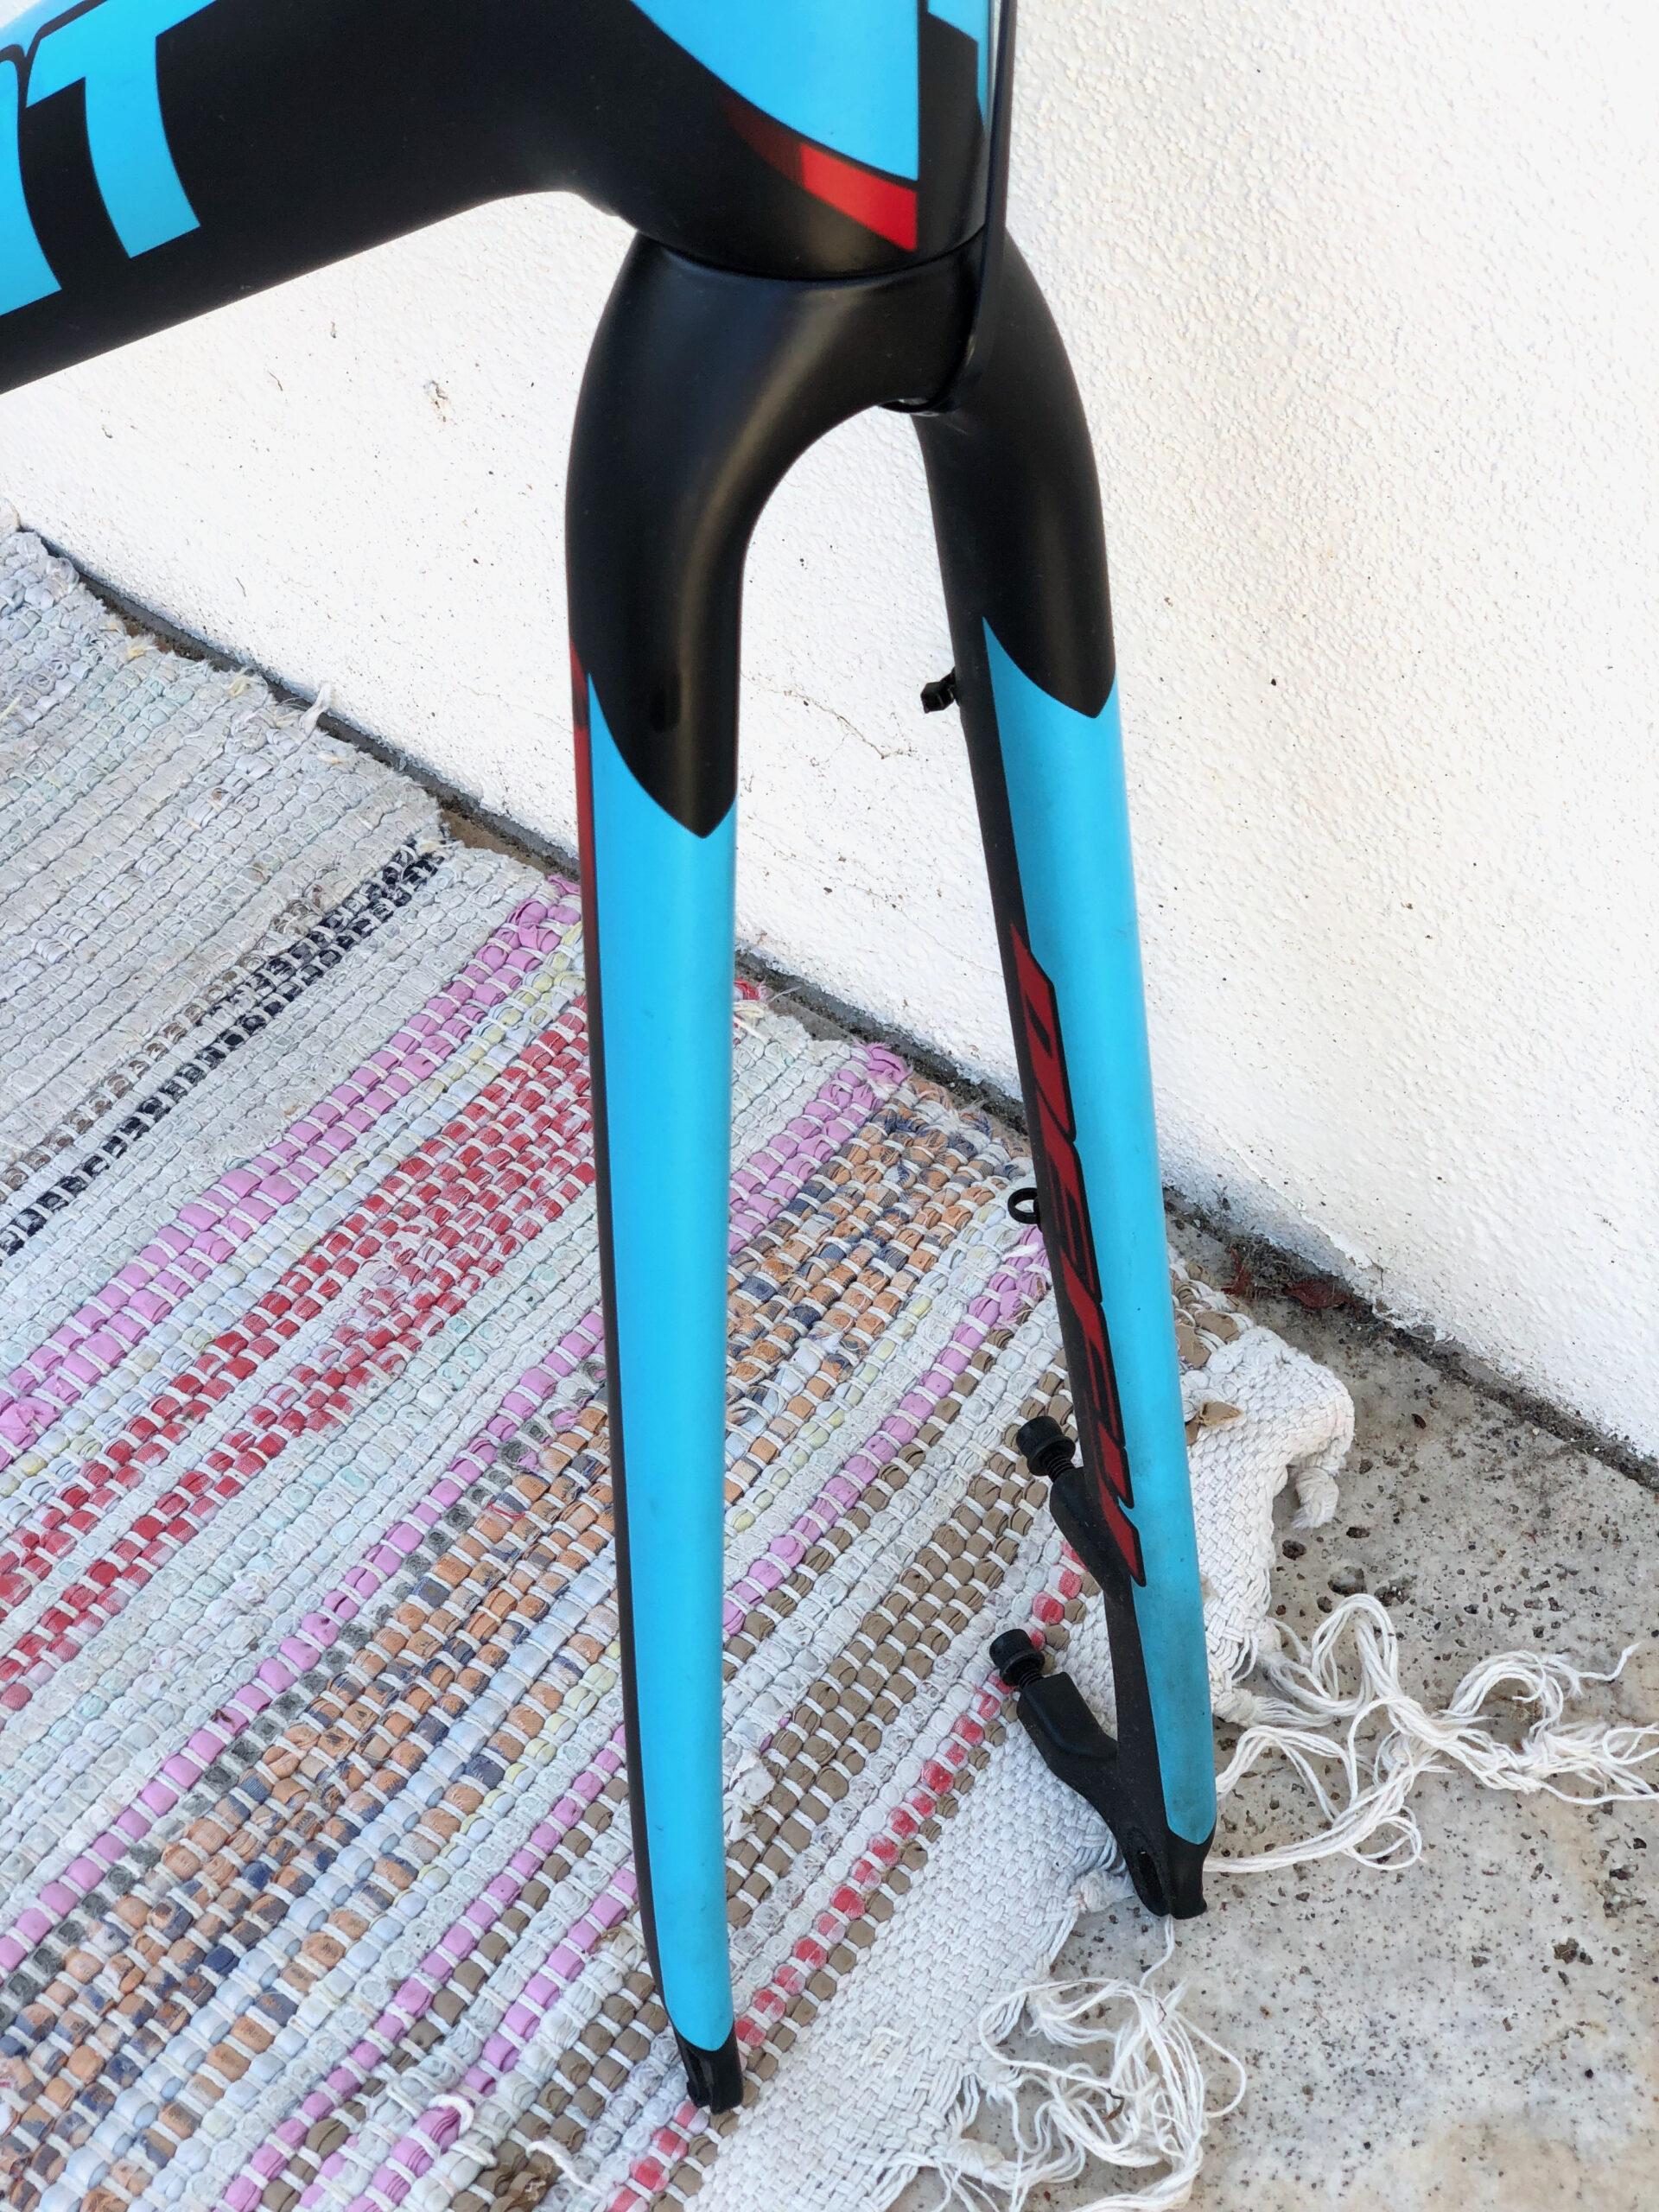 Giant Defy Advanced SL 0 Disc Carbon Road Bike Frameset w Integrated Seatpost Large